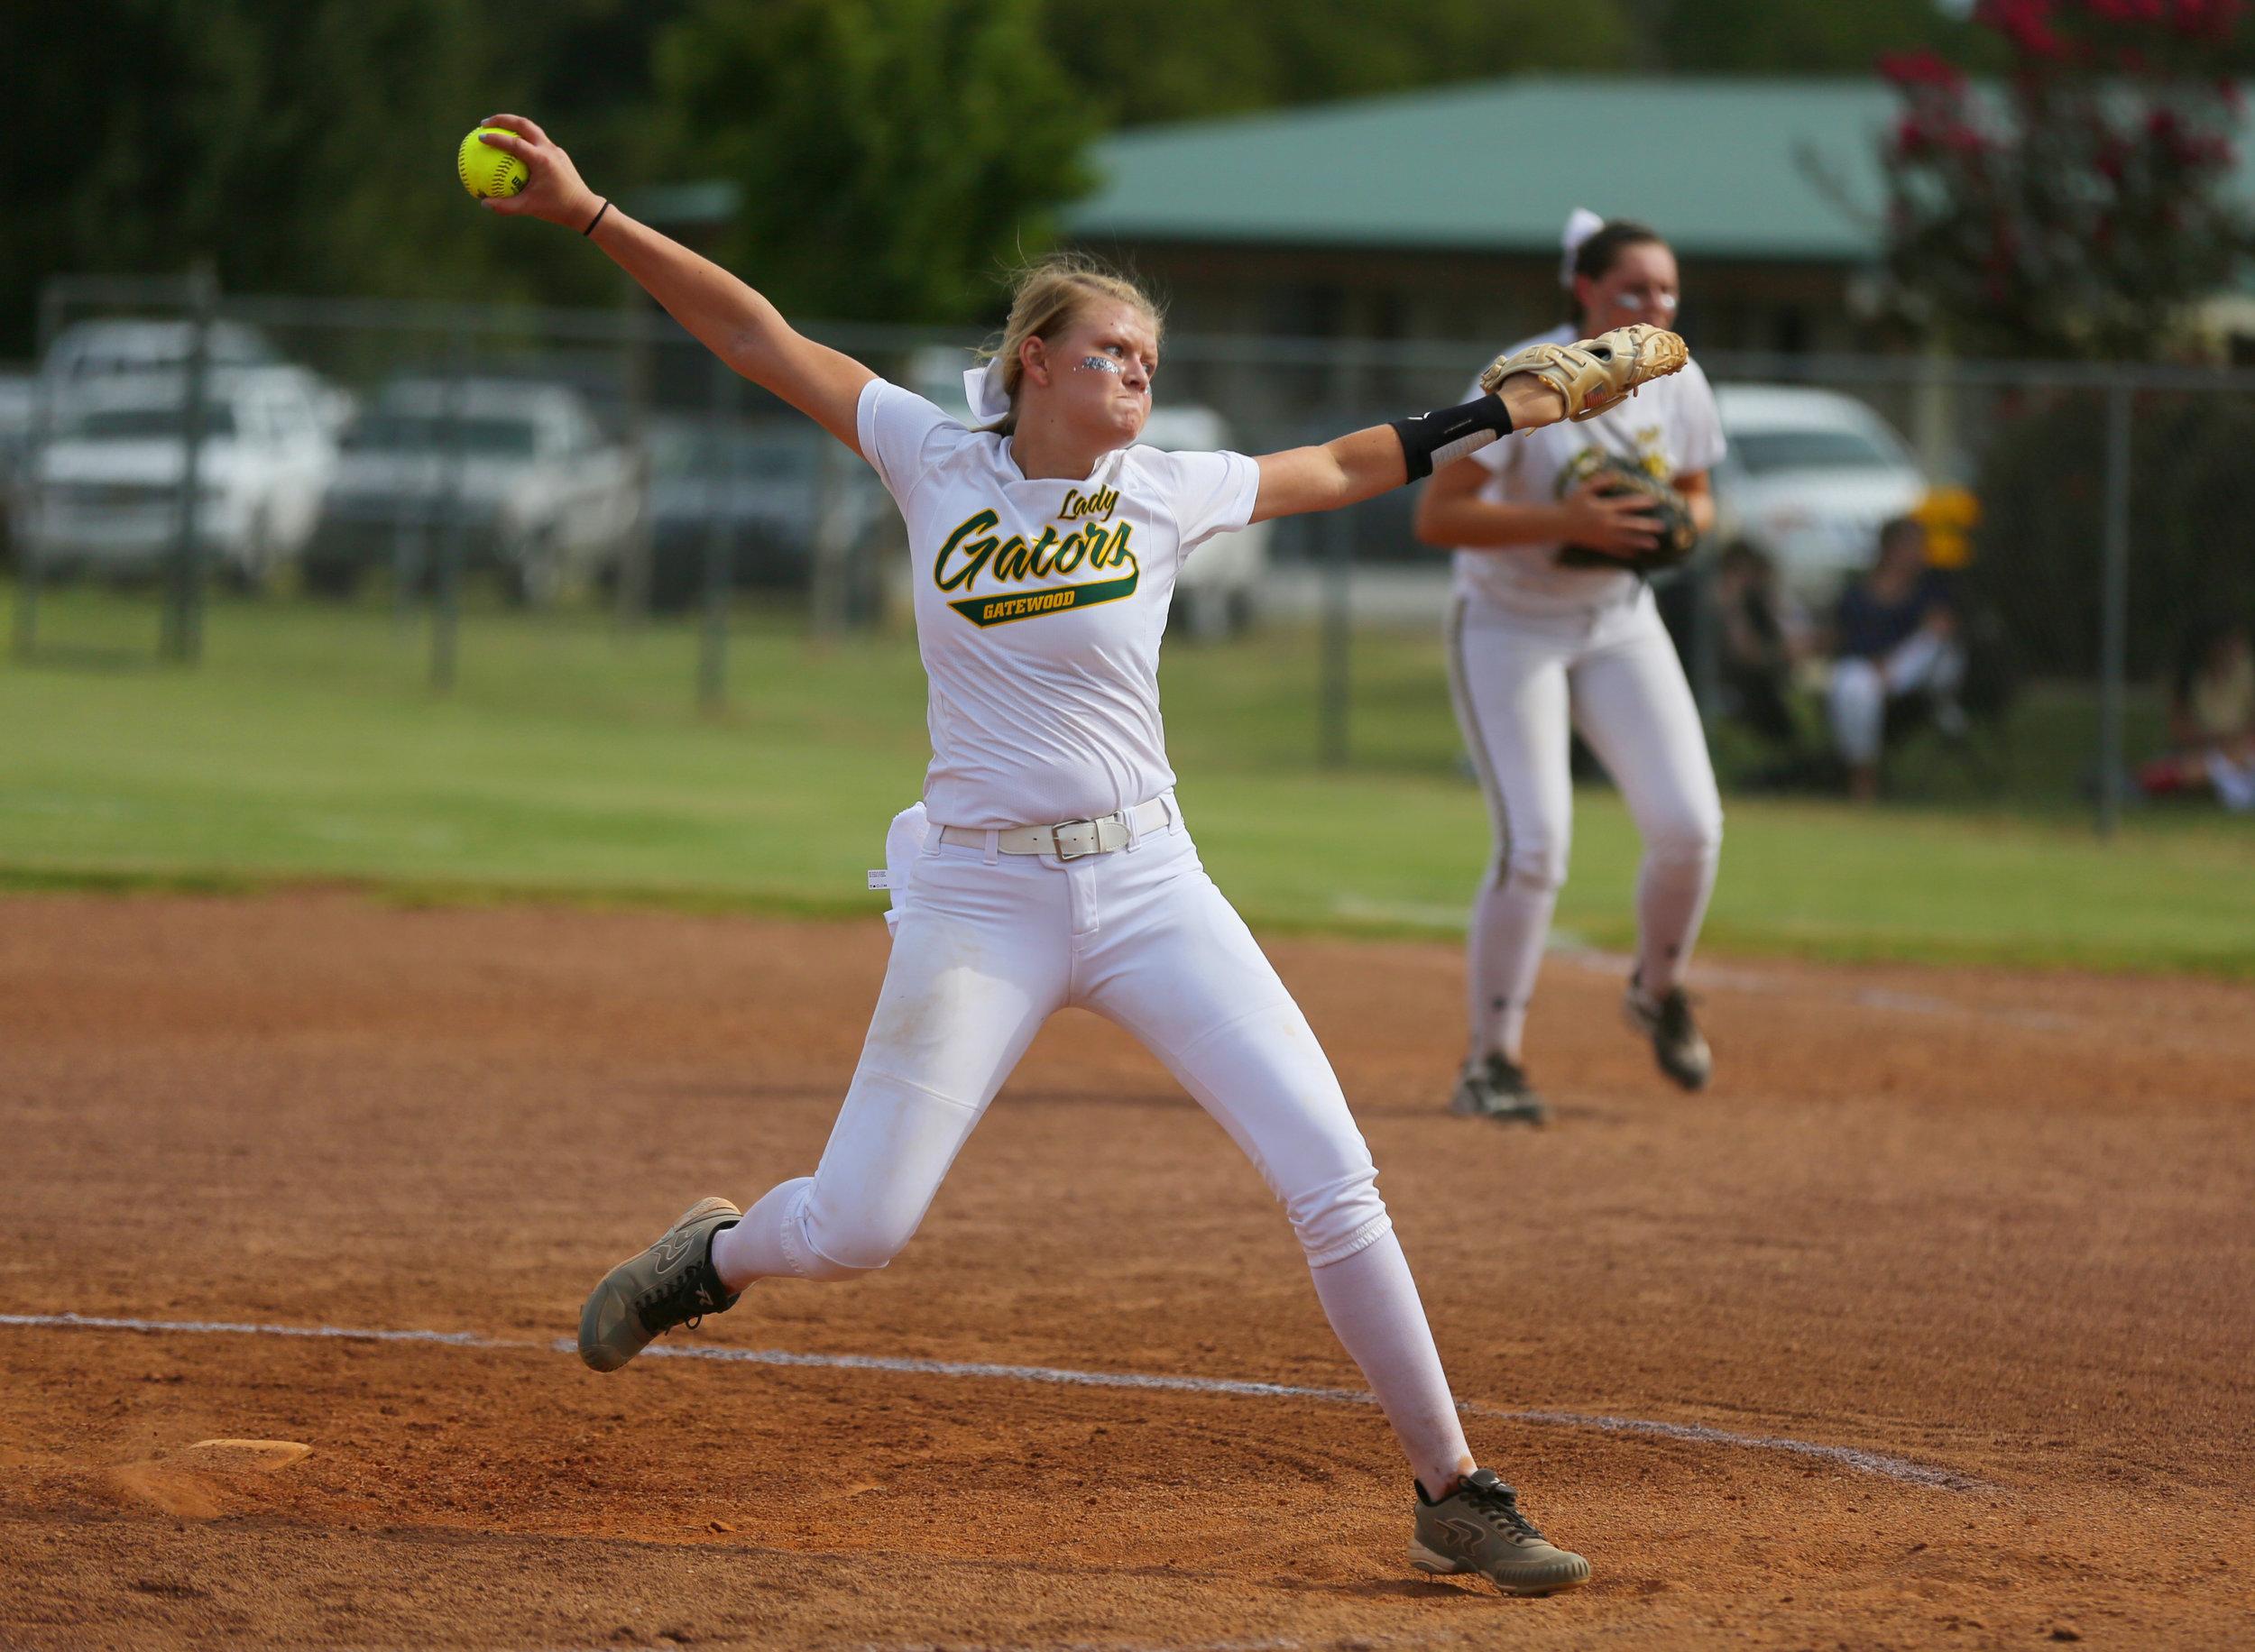 softball1 (3).JPG